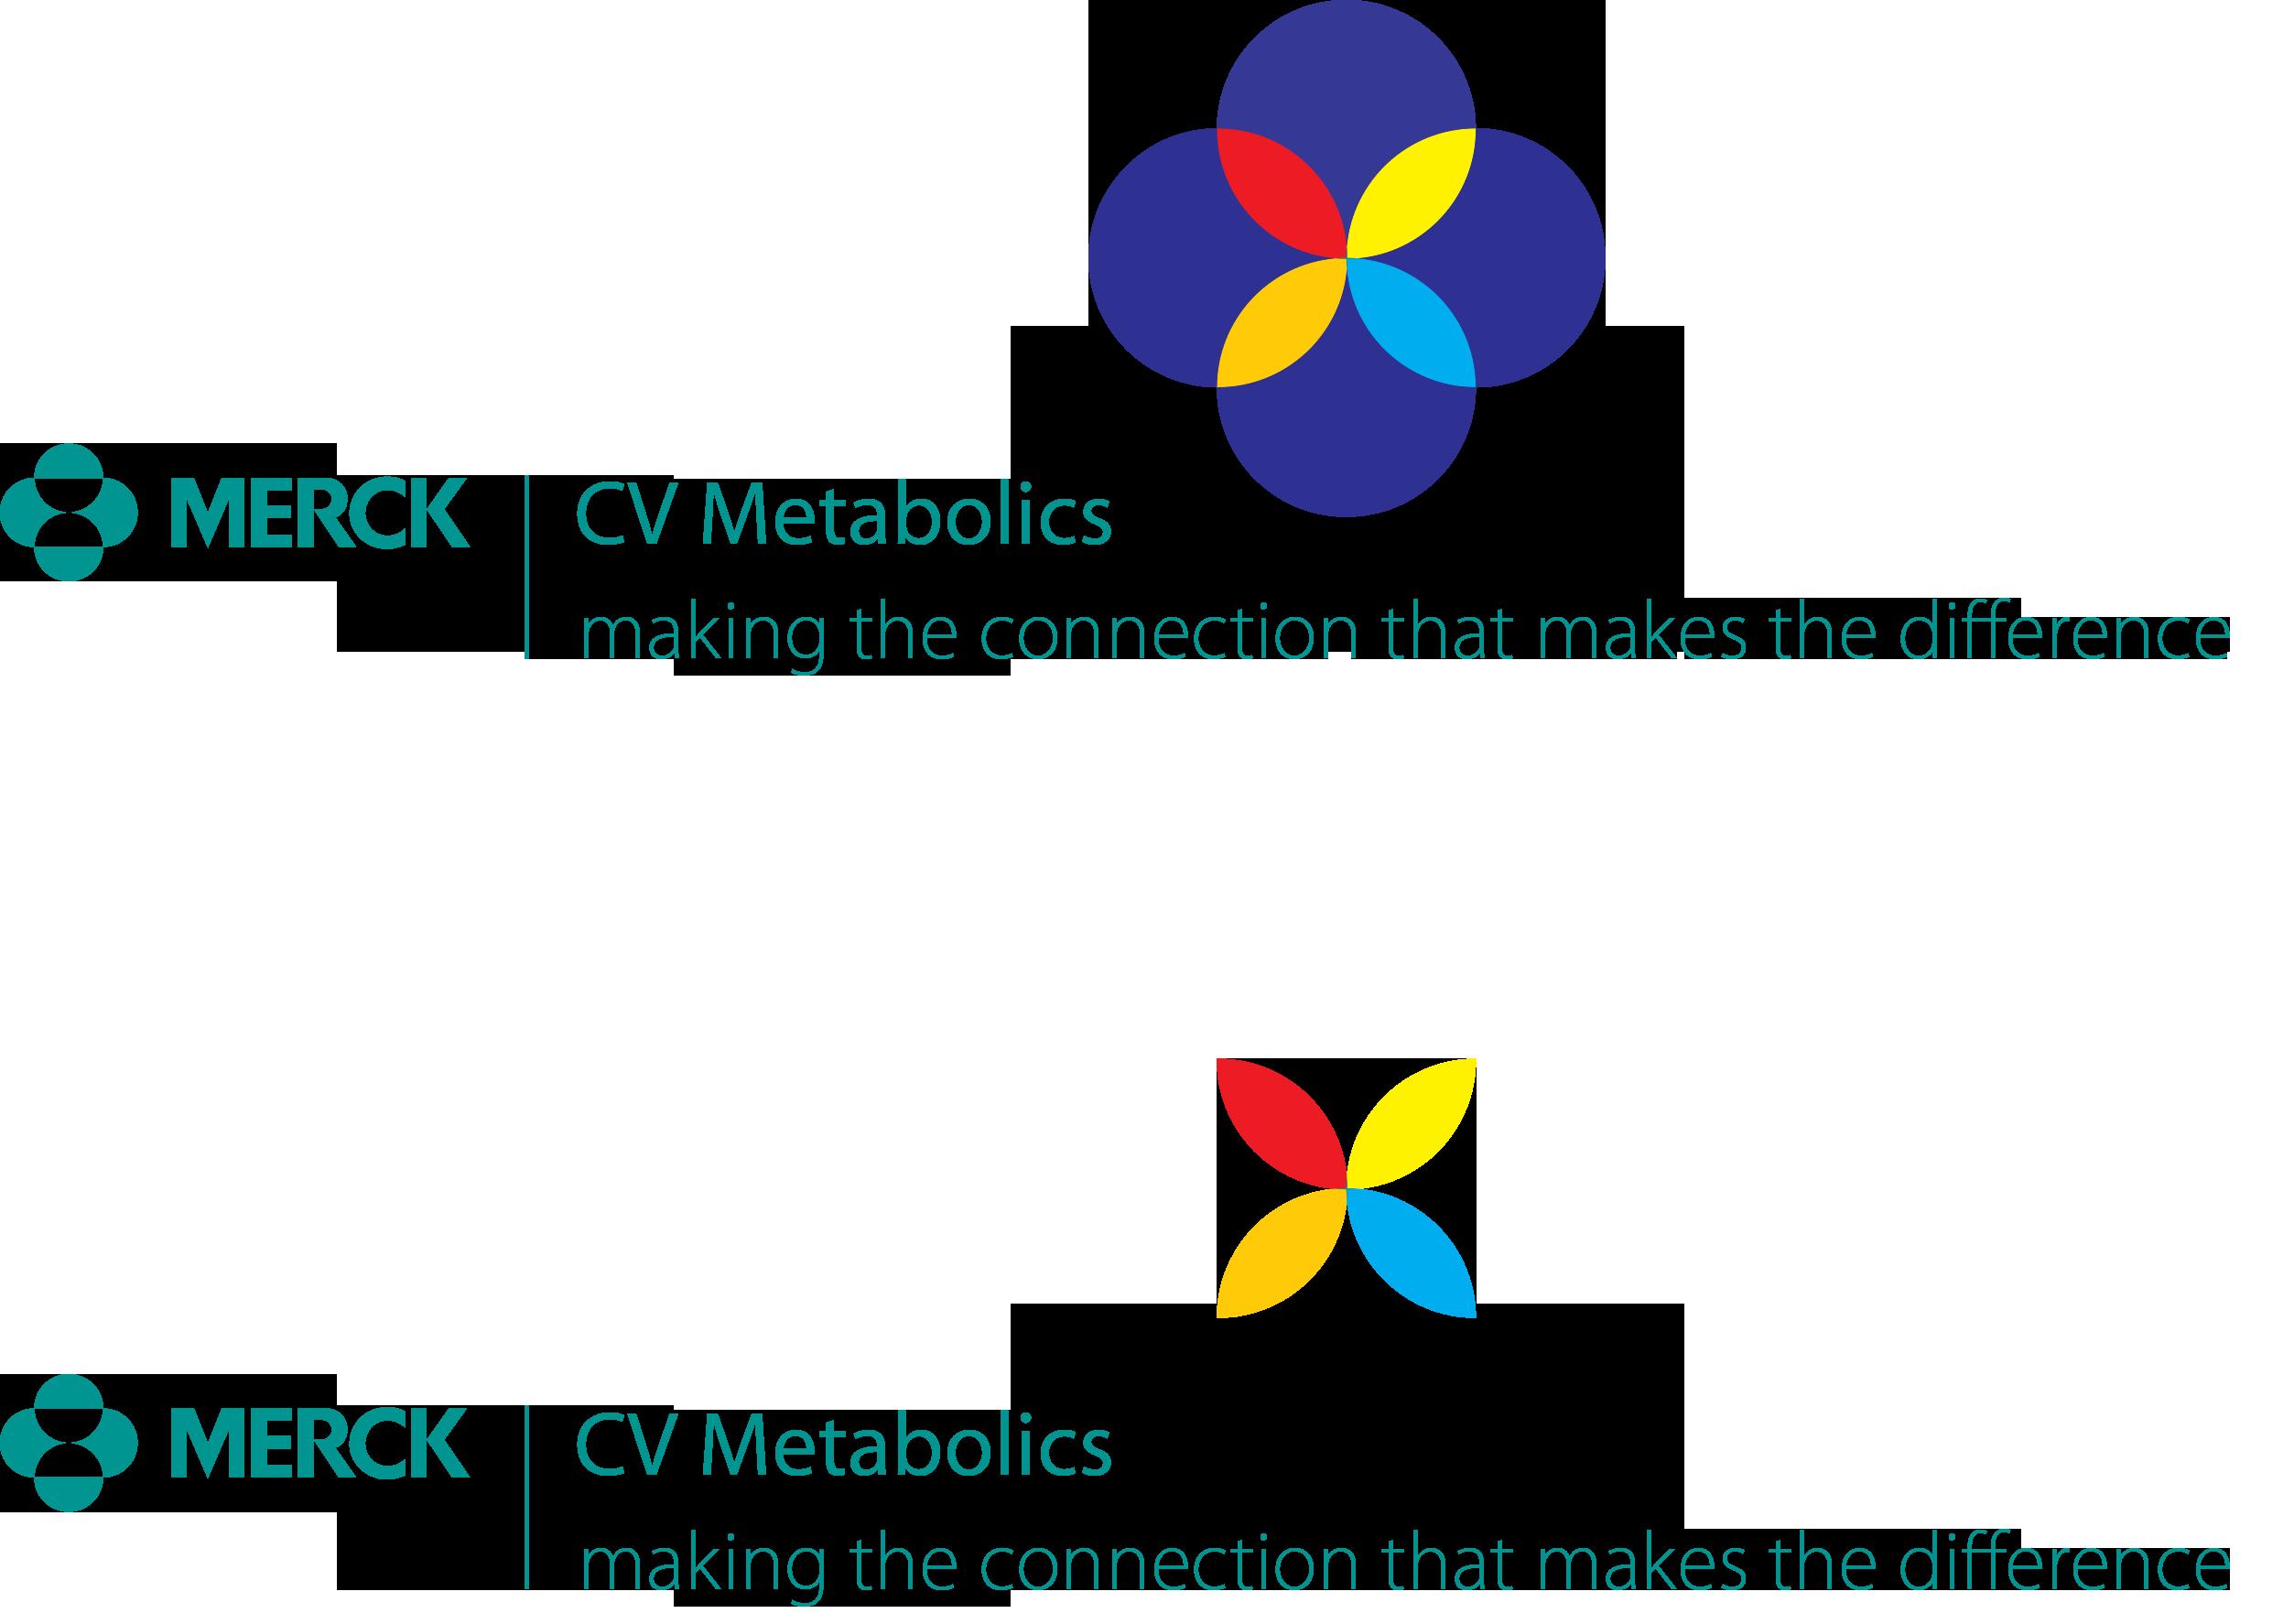 Merck CV Metabolics Branding Concept